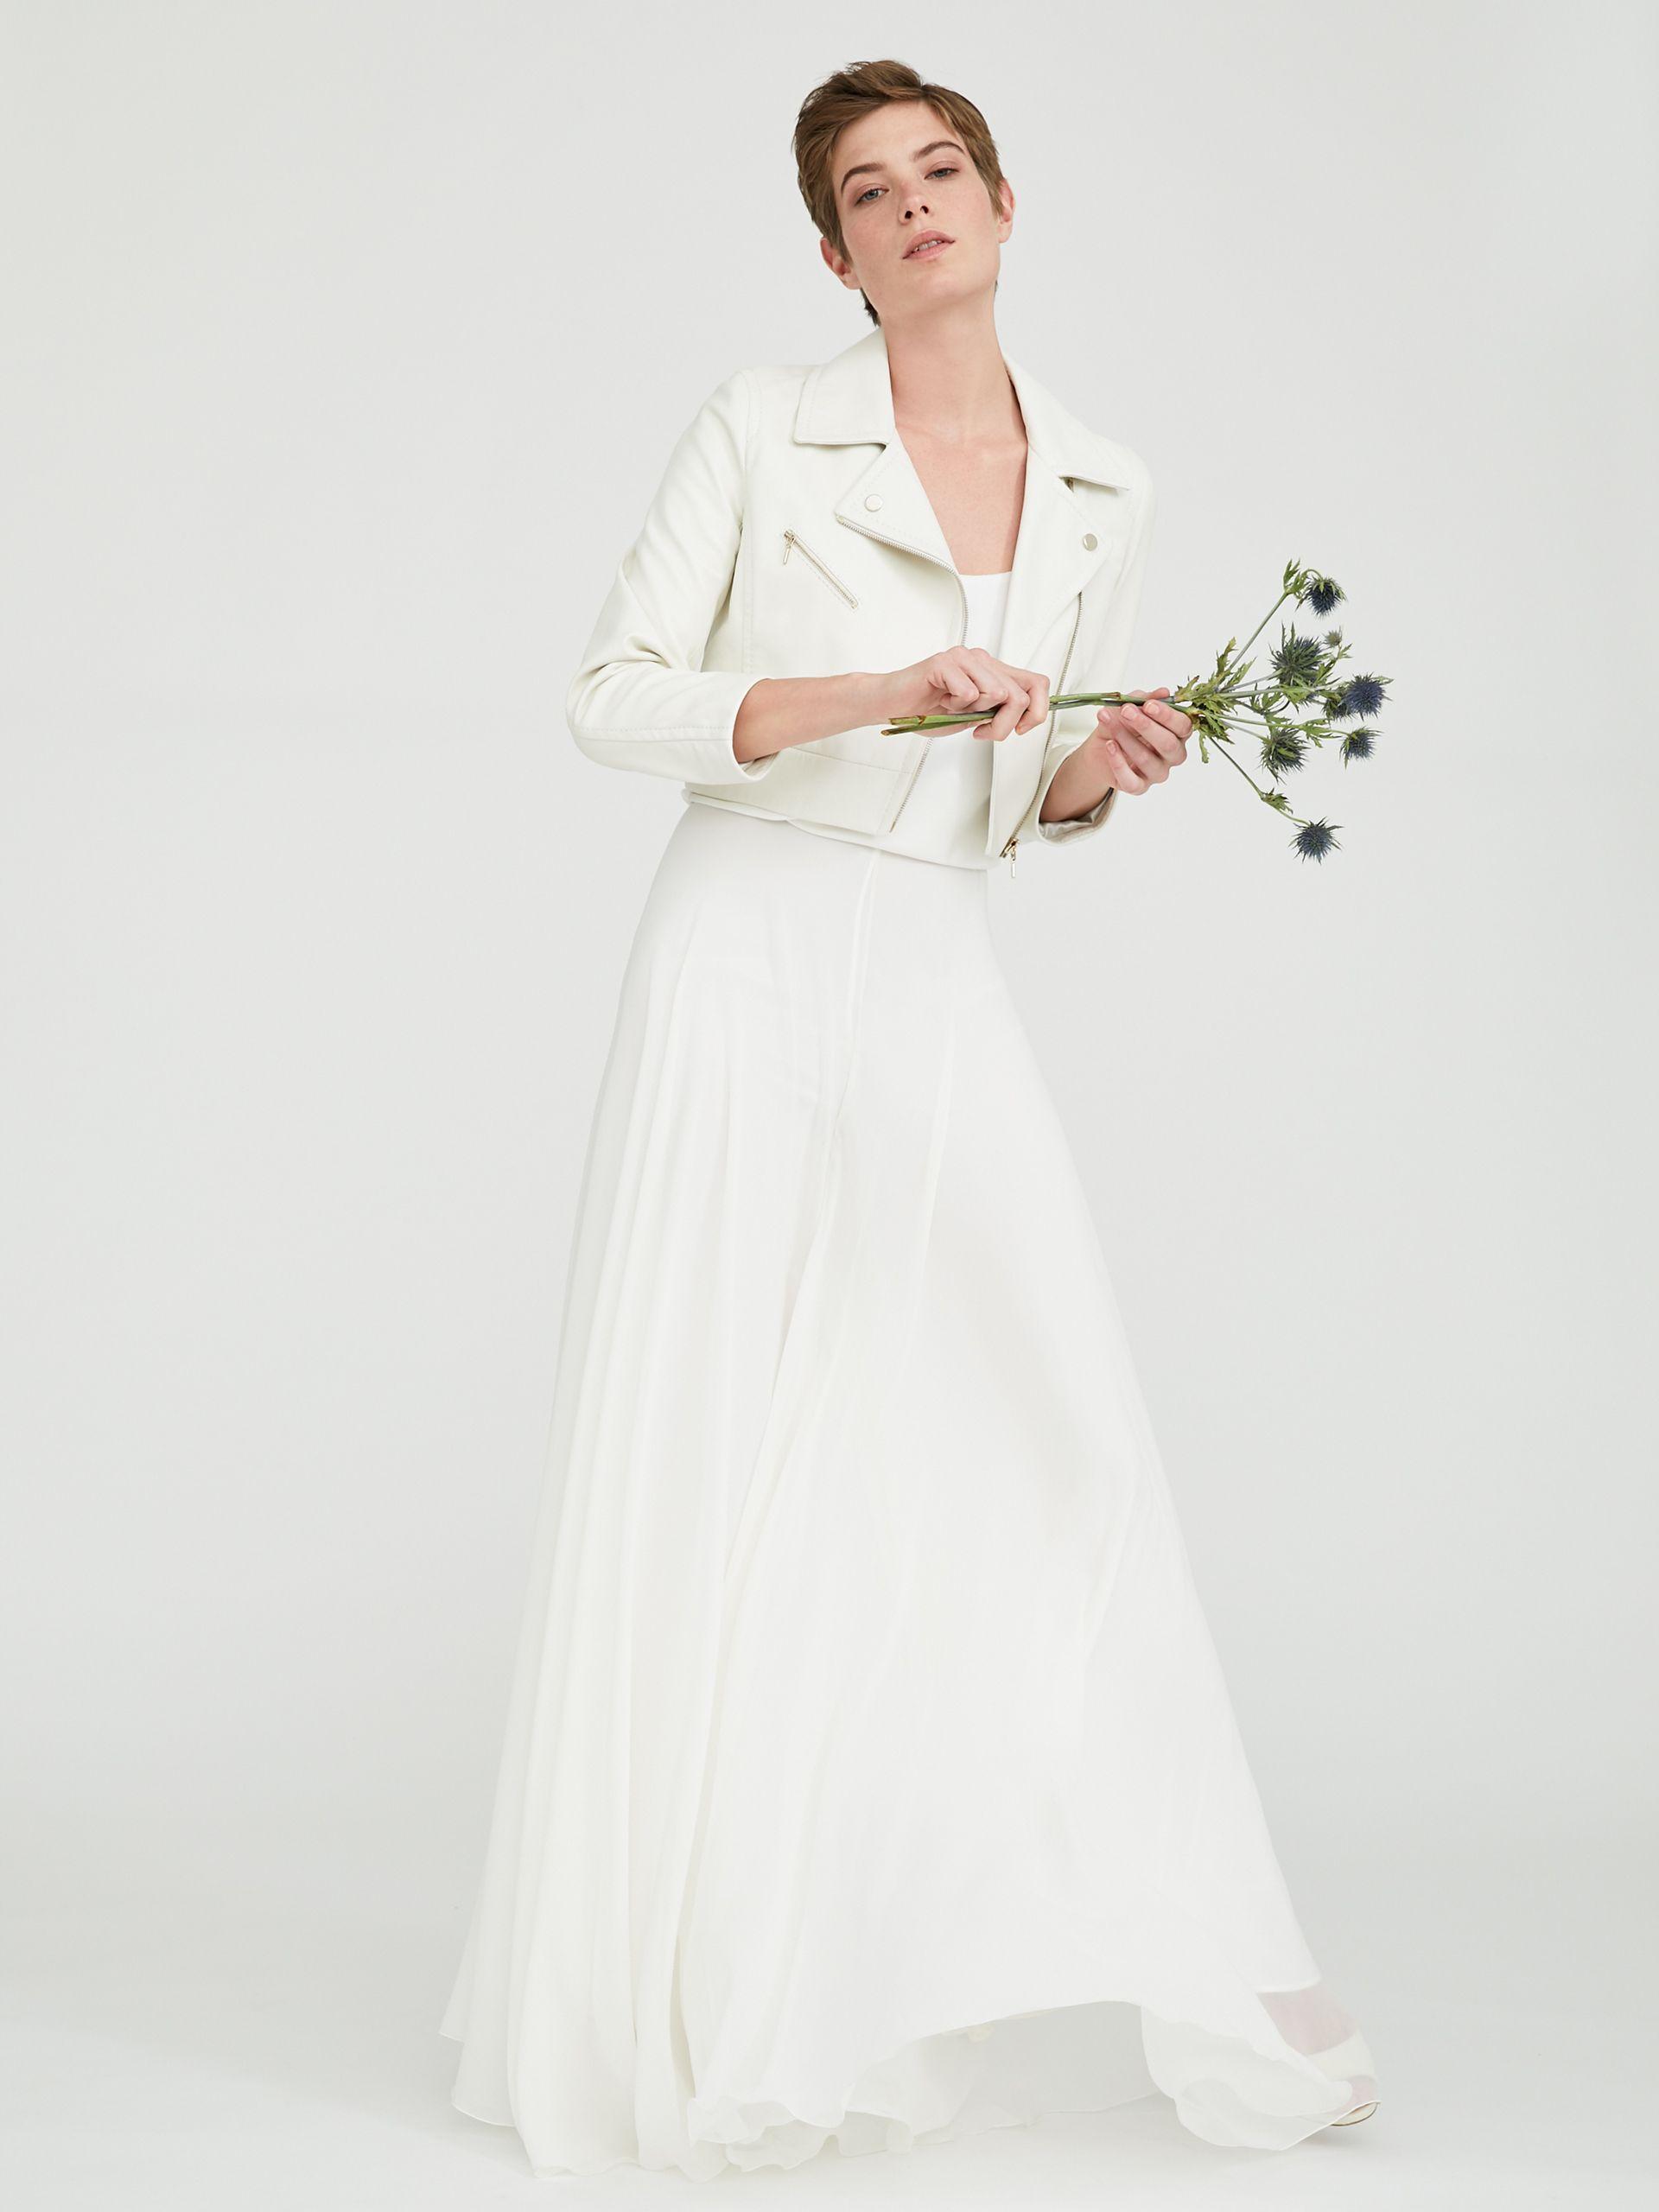 Max Mara Bridal Biker Jacket In Nappa Leather White Leather Wedding Dress Leather Jacket Wedding Dress Leather Wedding Dress [ 2560 x 1920 Pixel ]